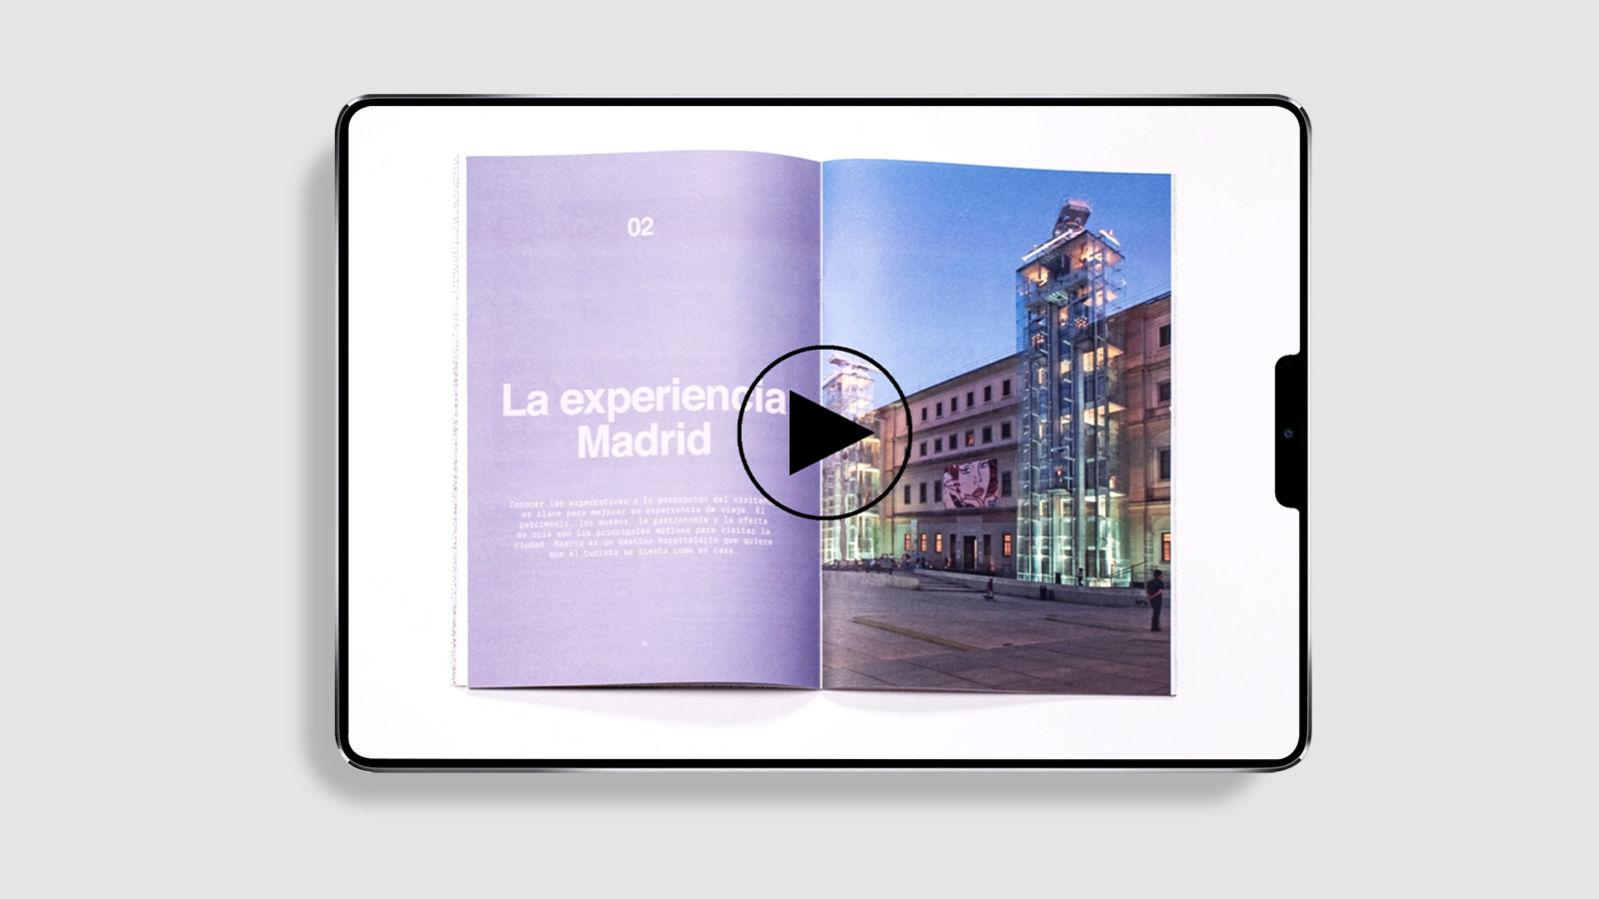 _madrid_destino2_1600x900_video